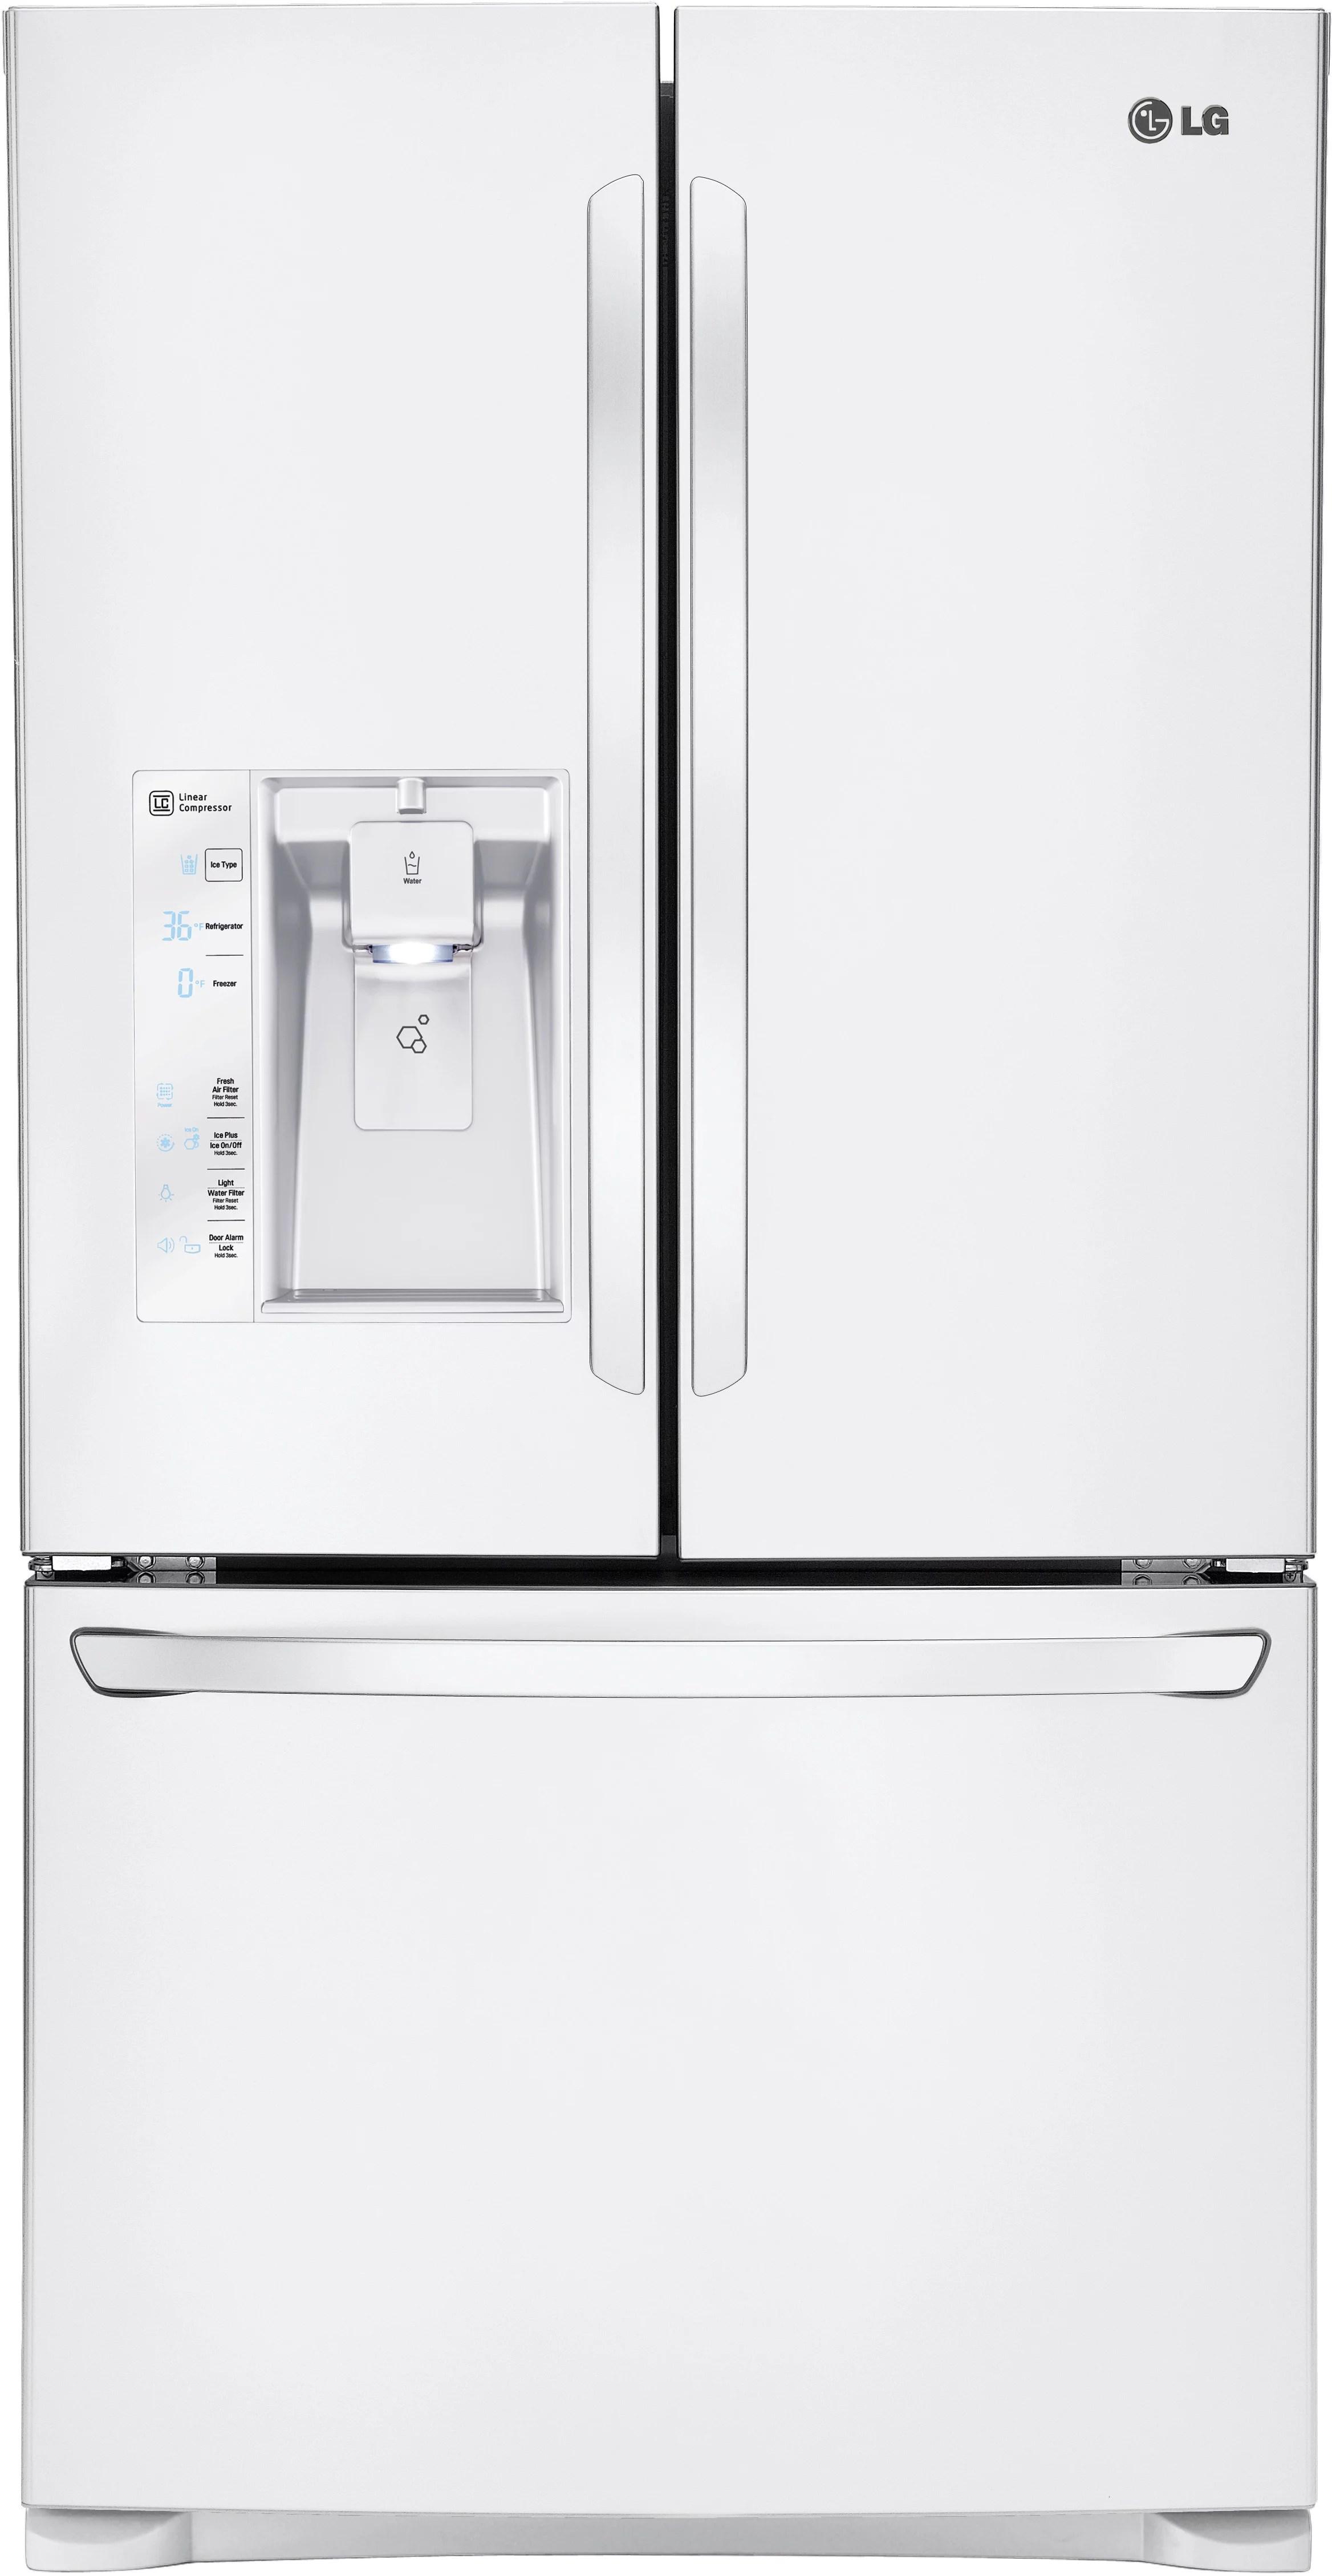 Lg Lfxs W 36 Inch French Door Refrigerator With Smart